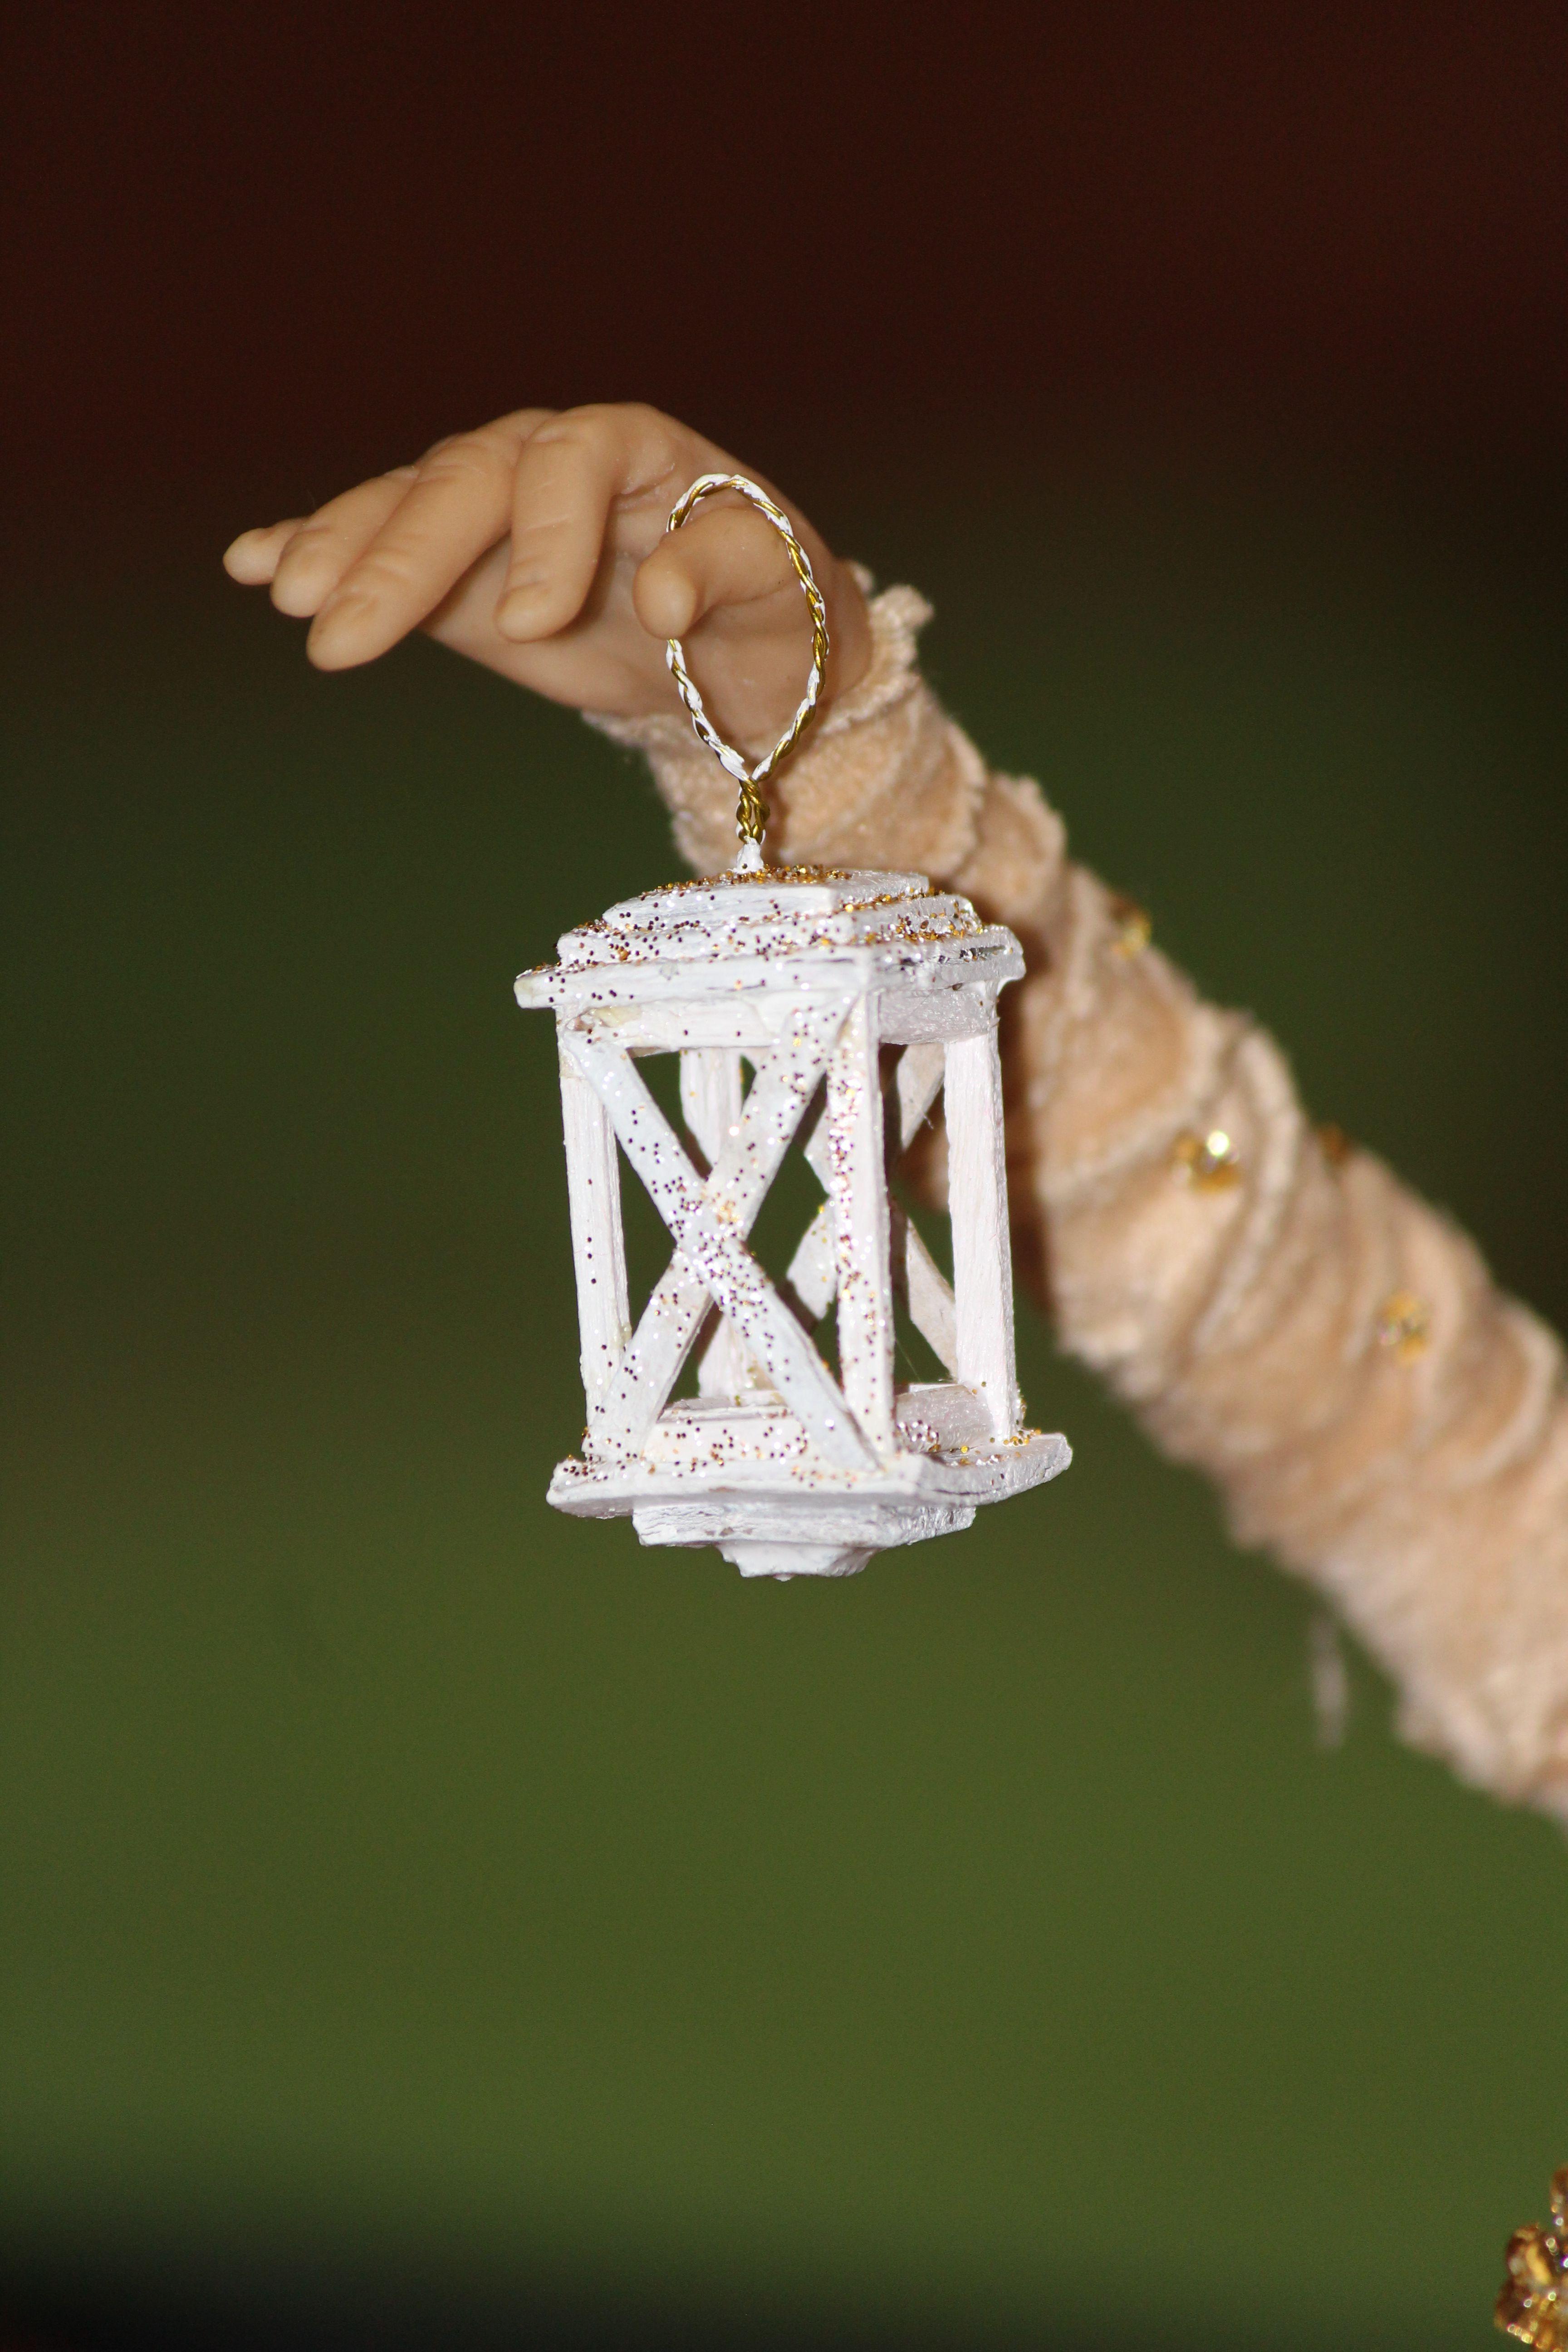 сувенир подарок куклавподарок авторскаякукла